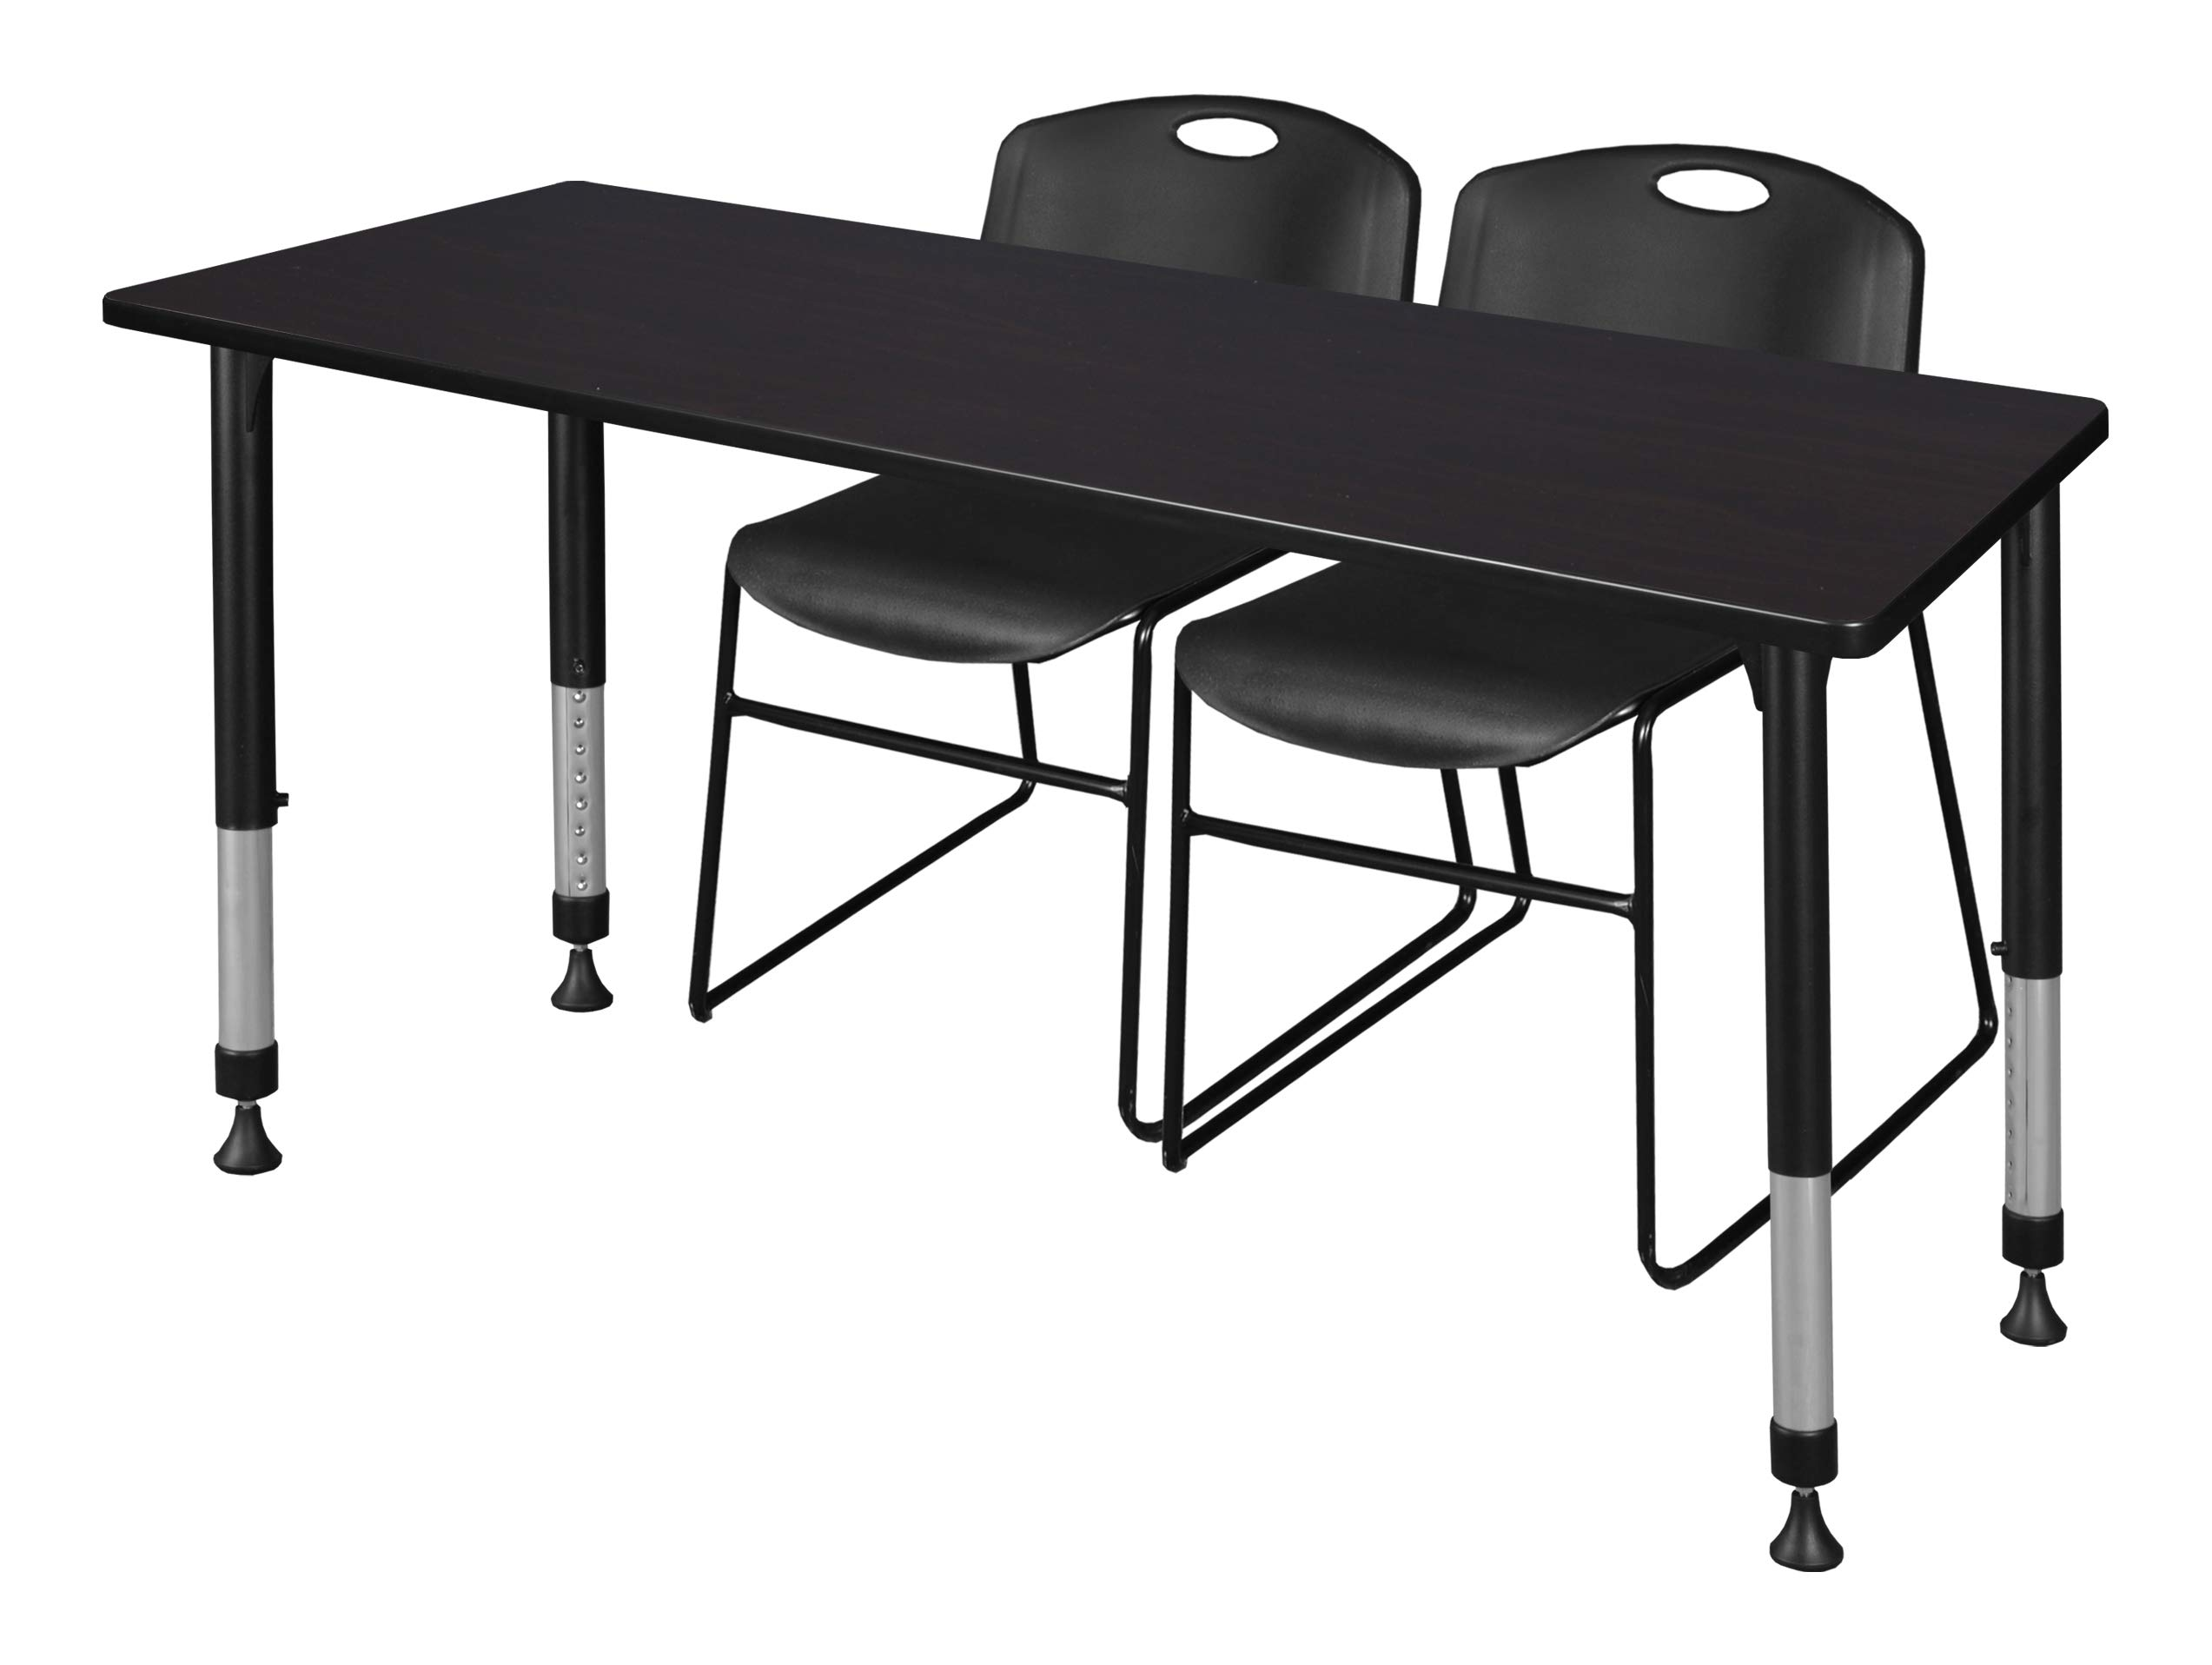 Regency MT6624MWAPBK44BK Kee Height Adjustable Classroom Table Set with Two Zeng Chairs, 66'' x 24'', Mocha Walnut/Black